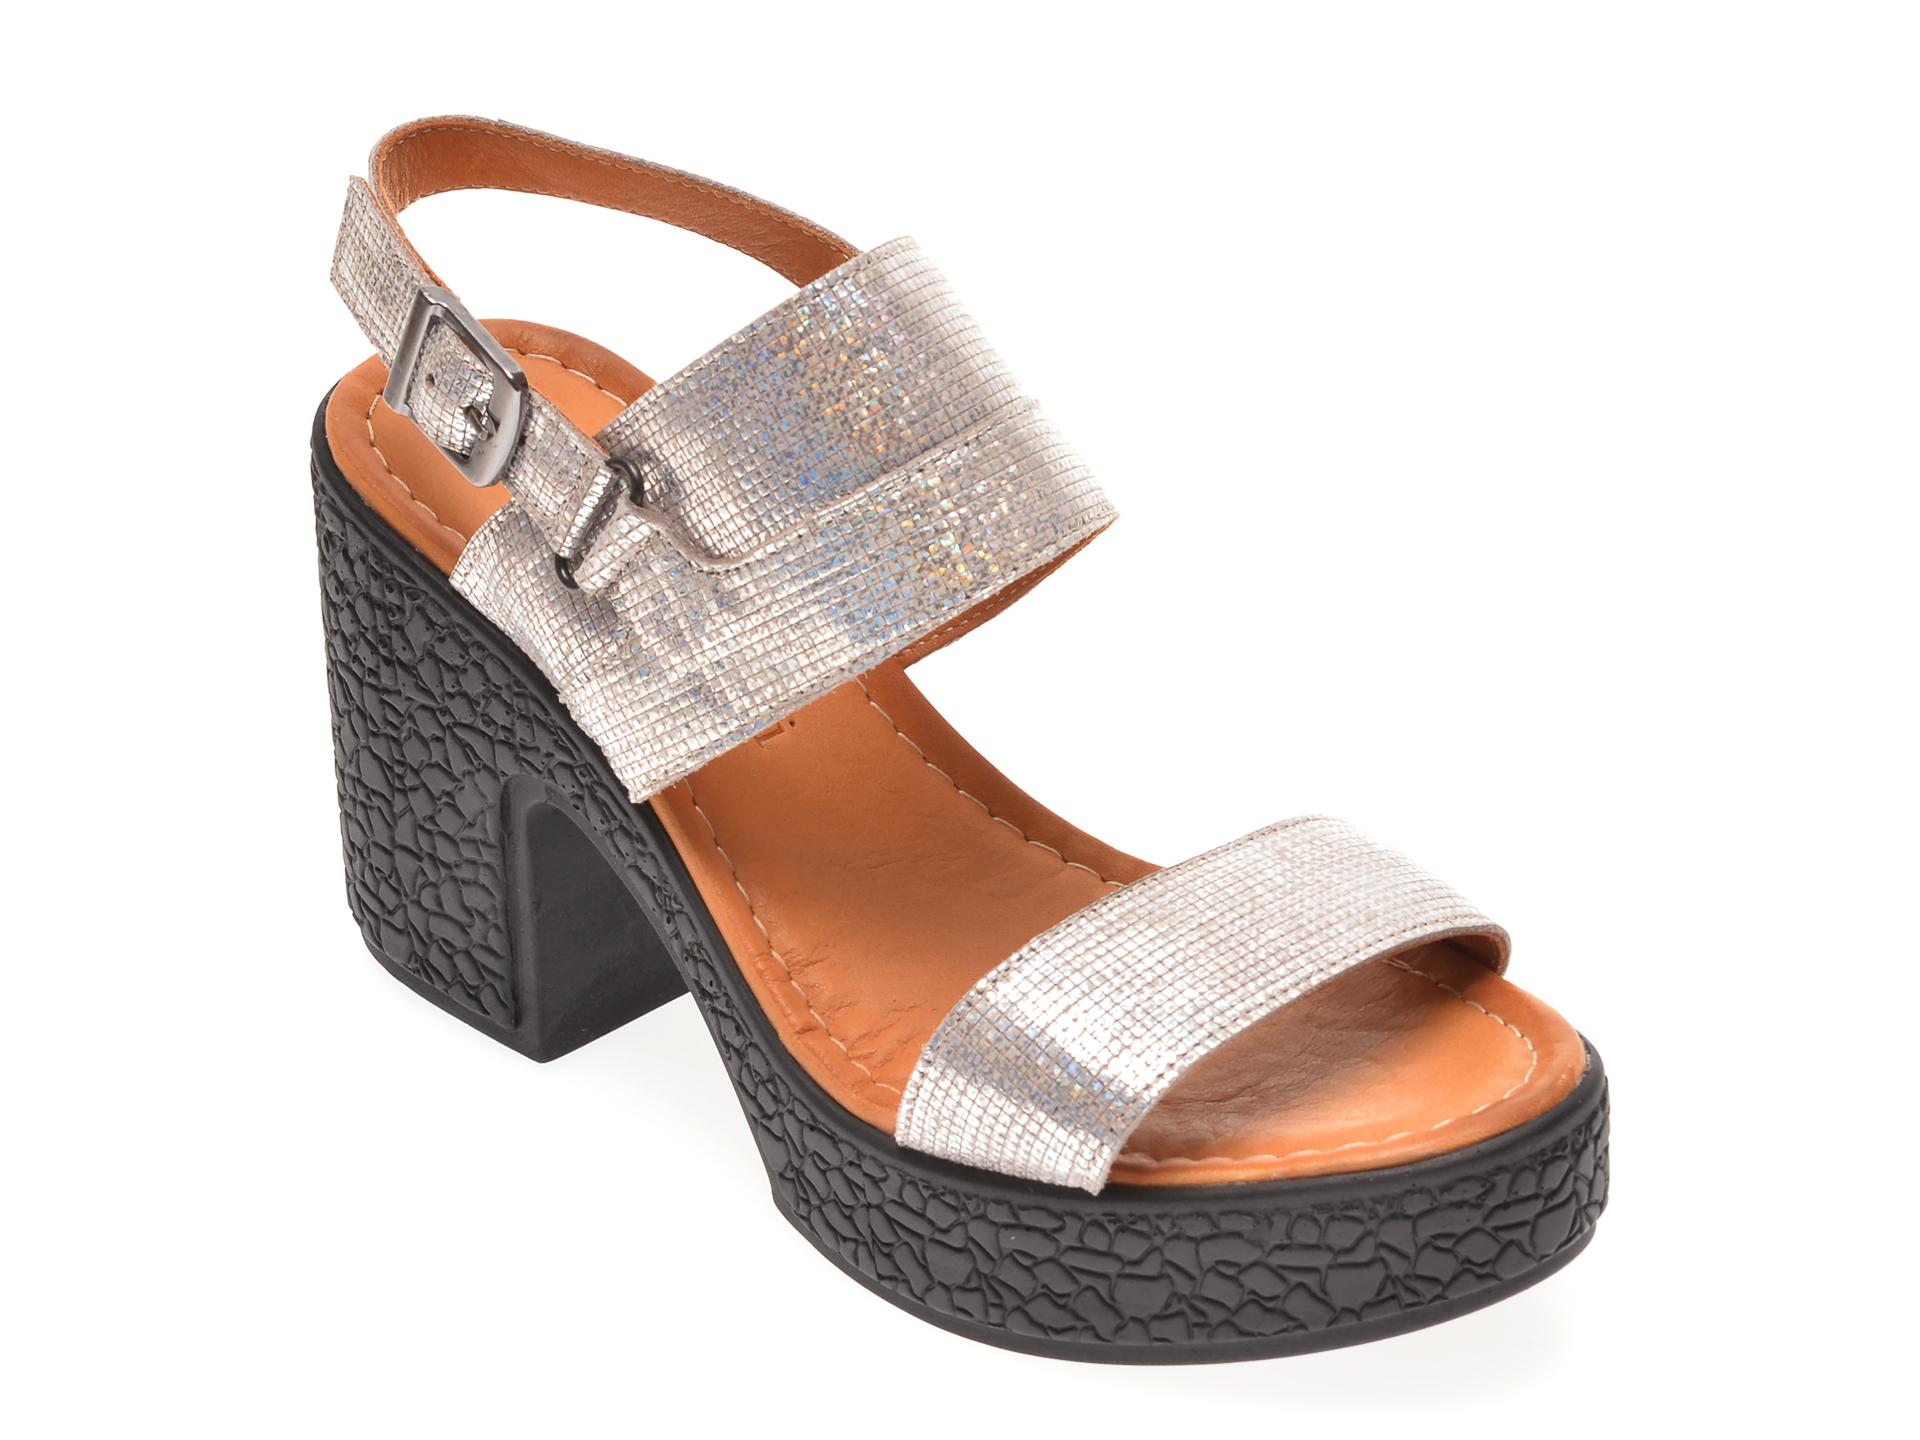 Sandale FLAVIA PASSINI gri, 1181762, din piele naturala